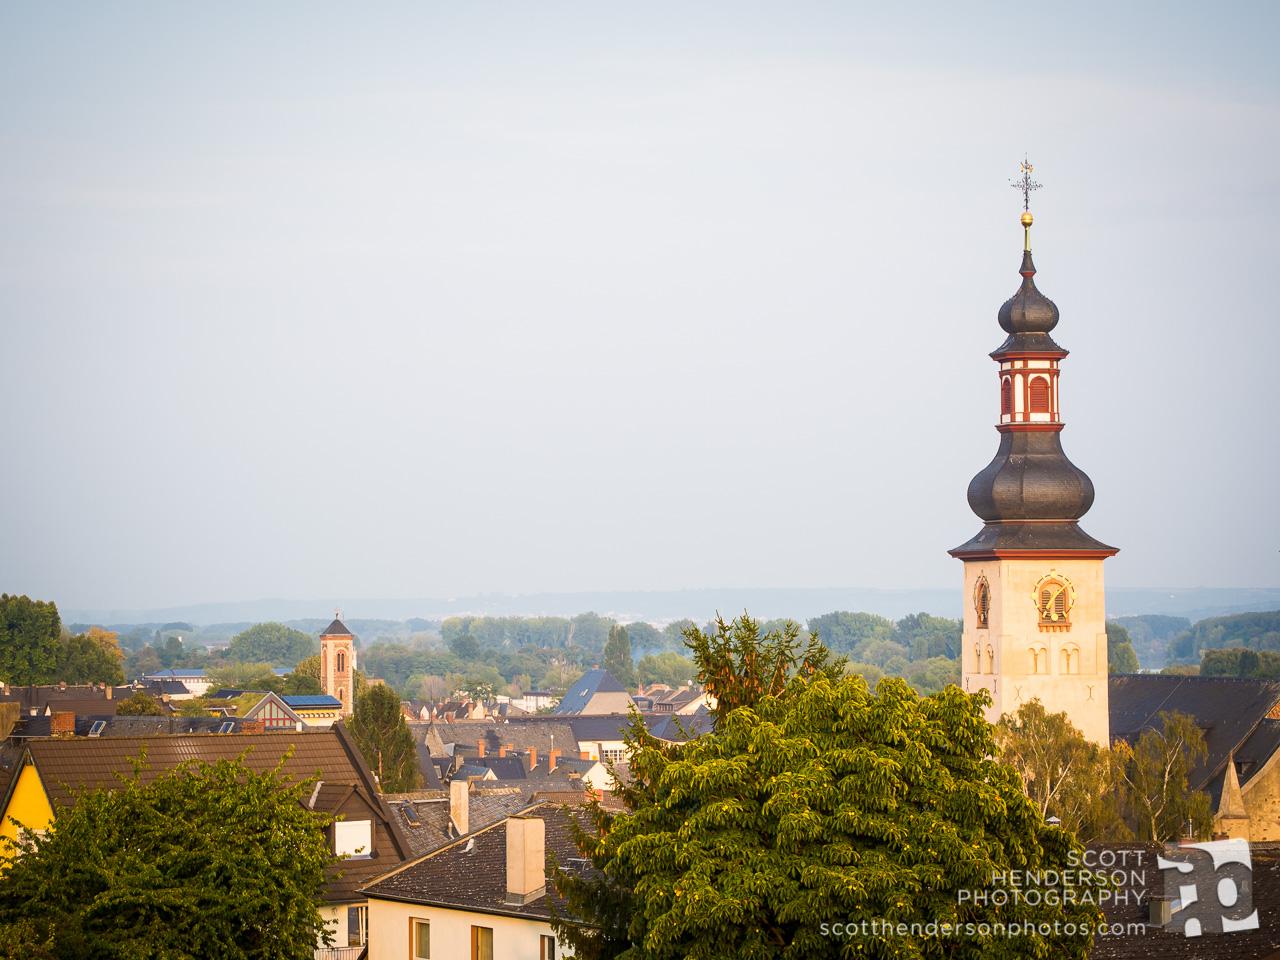 shp-germany-2014-023-blog.jpg